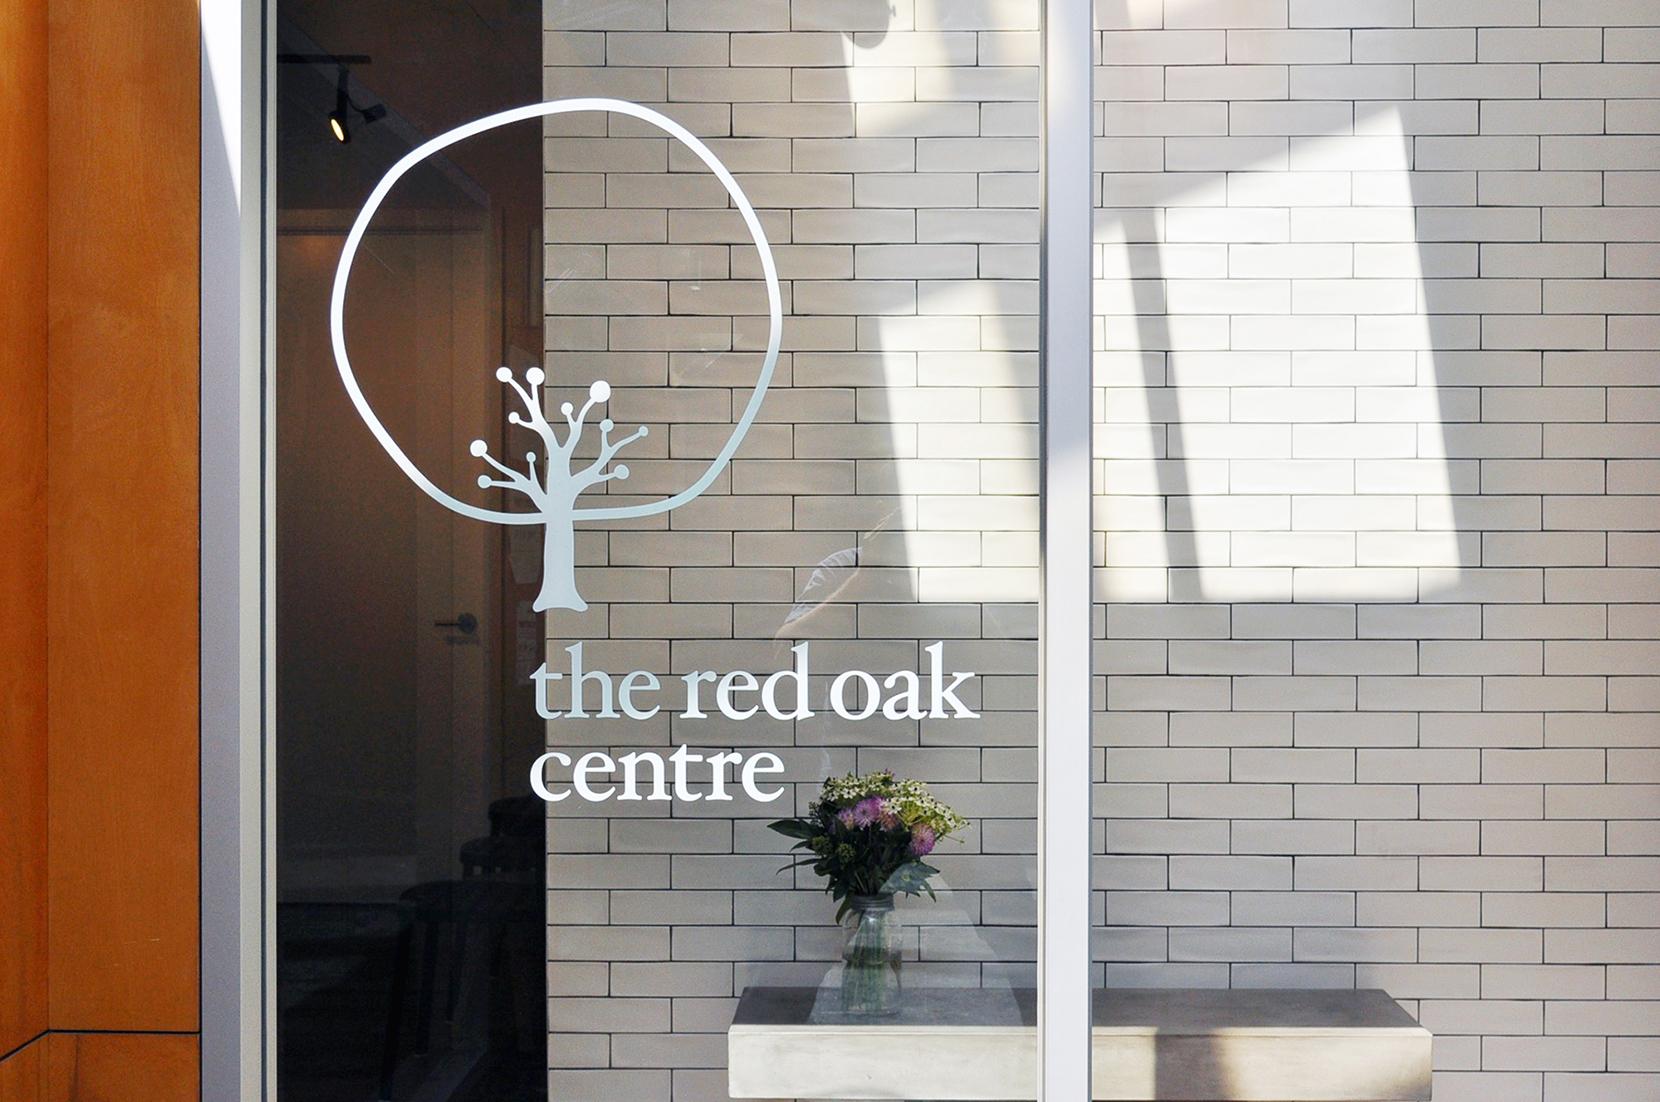 TheRedOak_sign